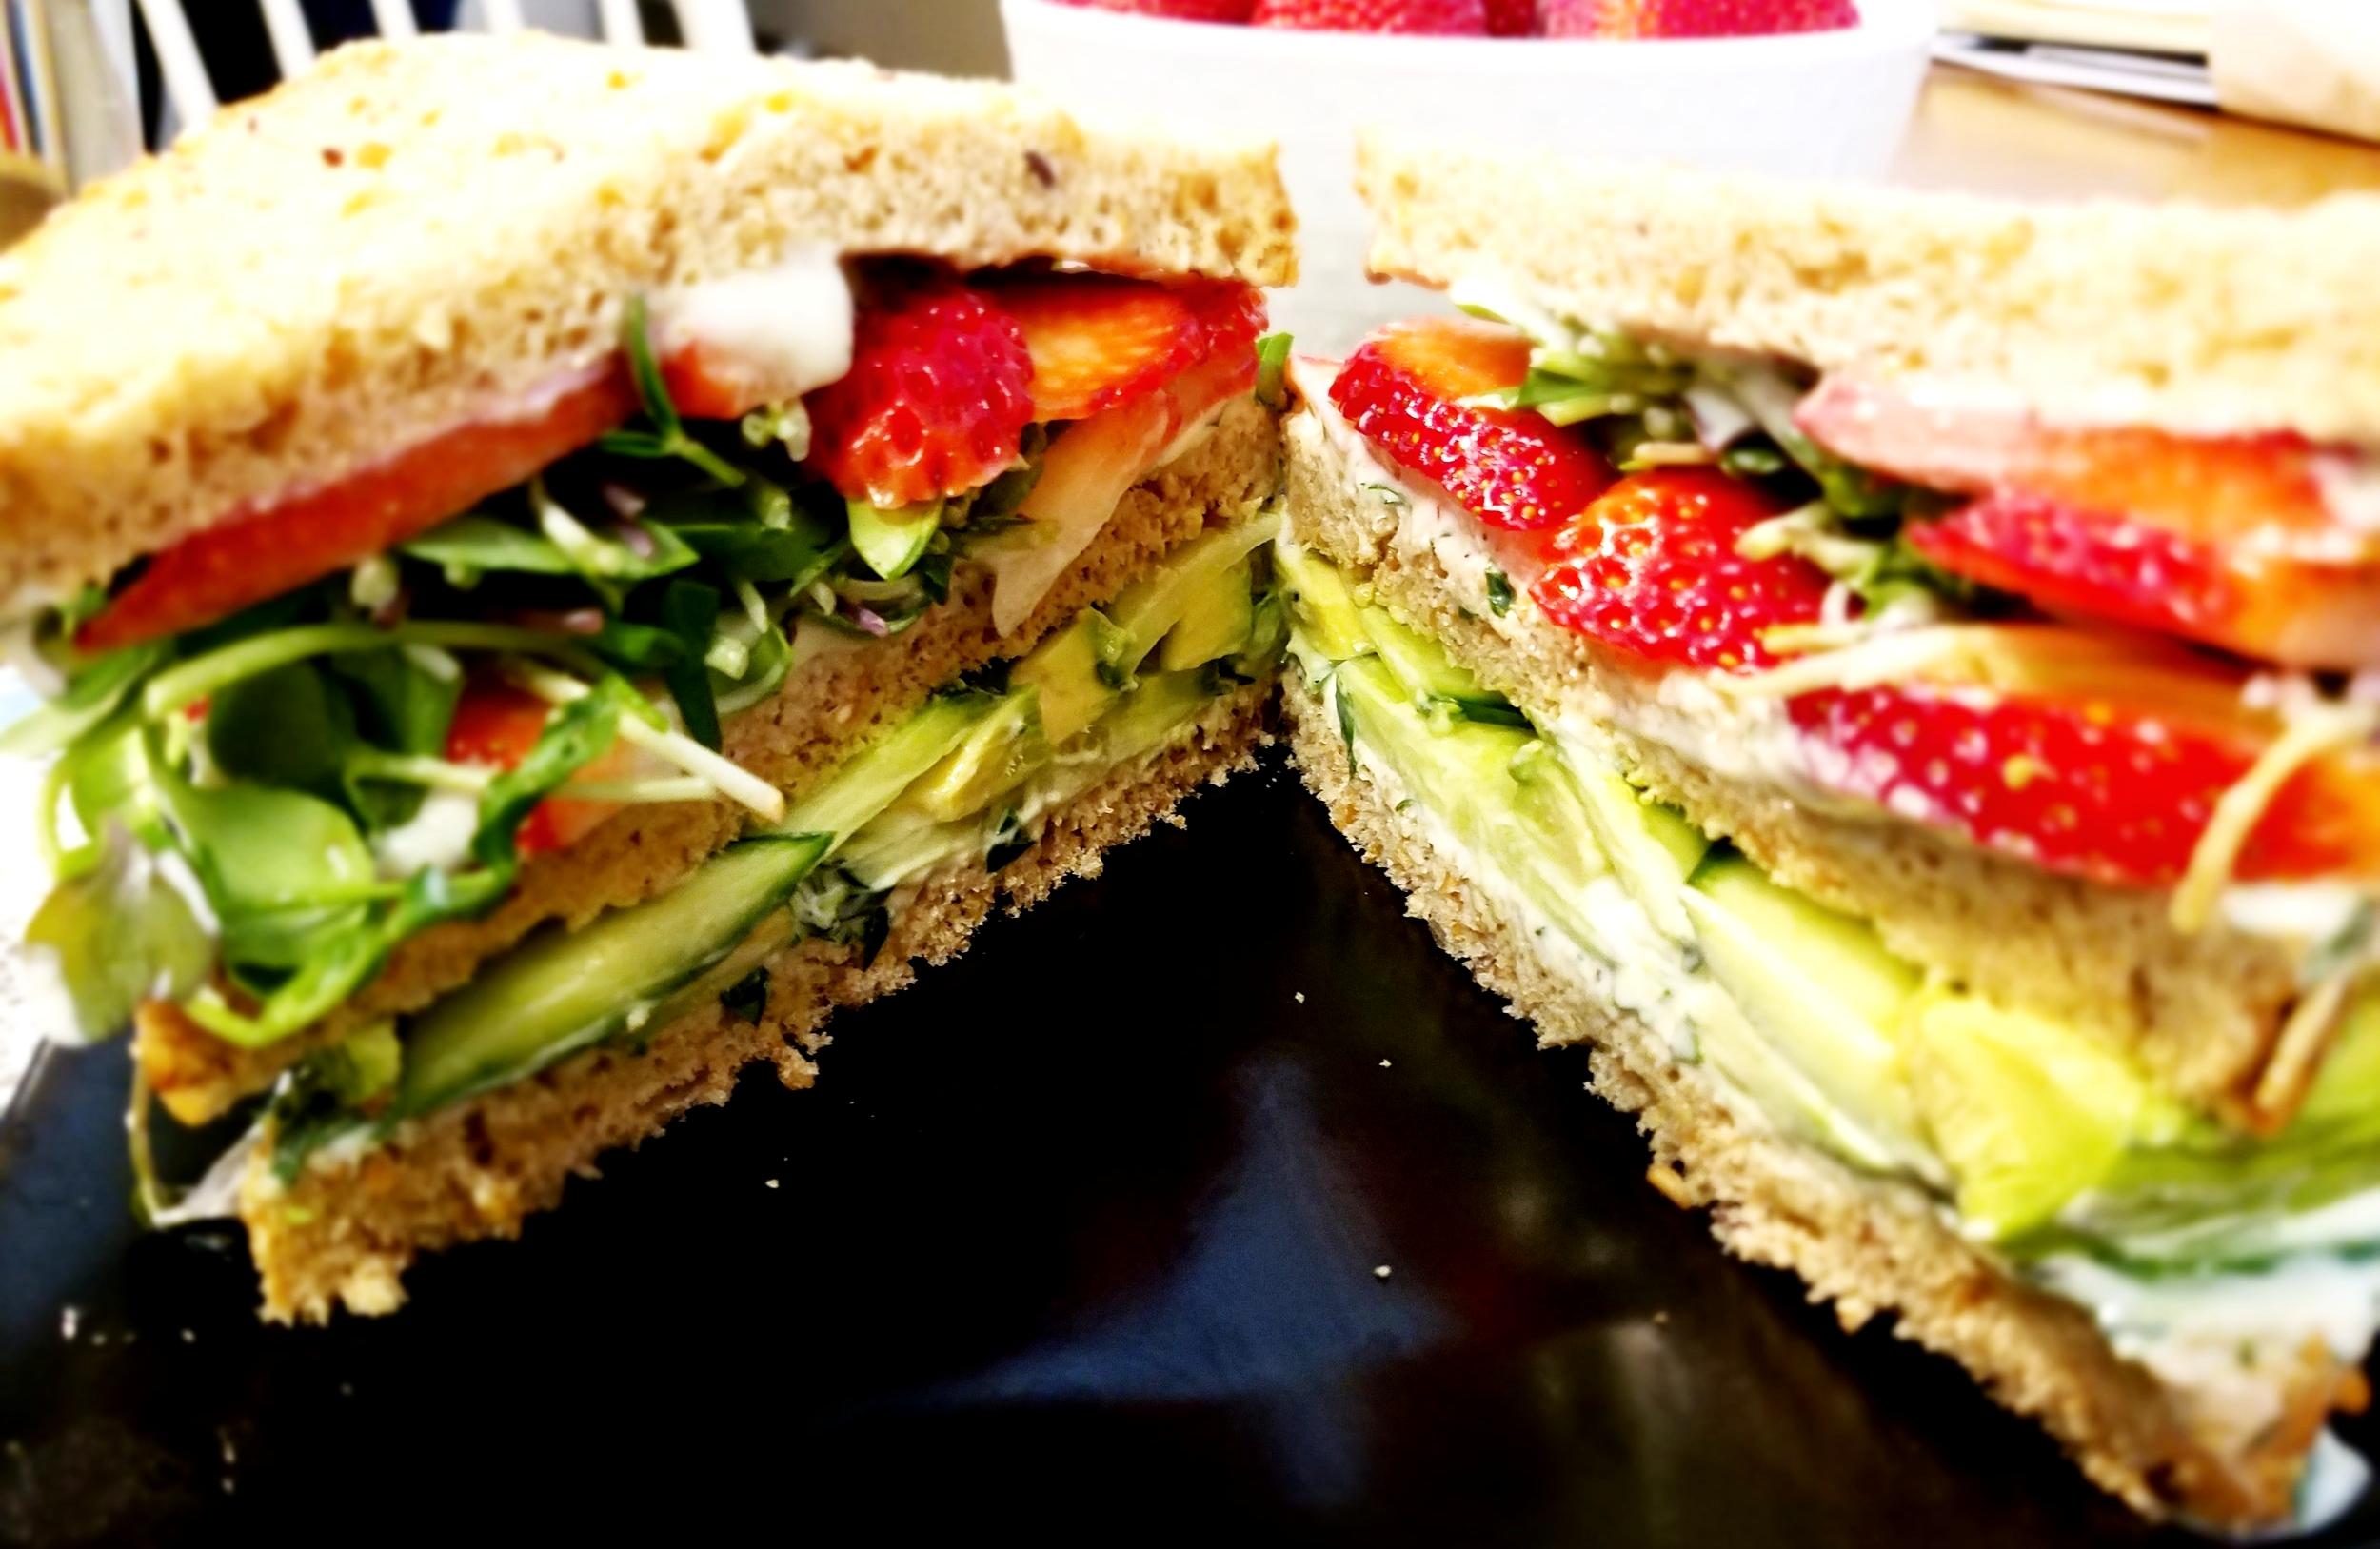 Strawberry Avocado Dagwood with Tarragon Mayo.jpg